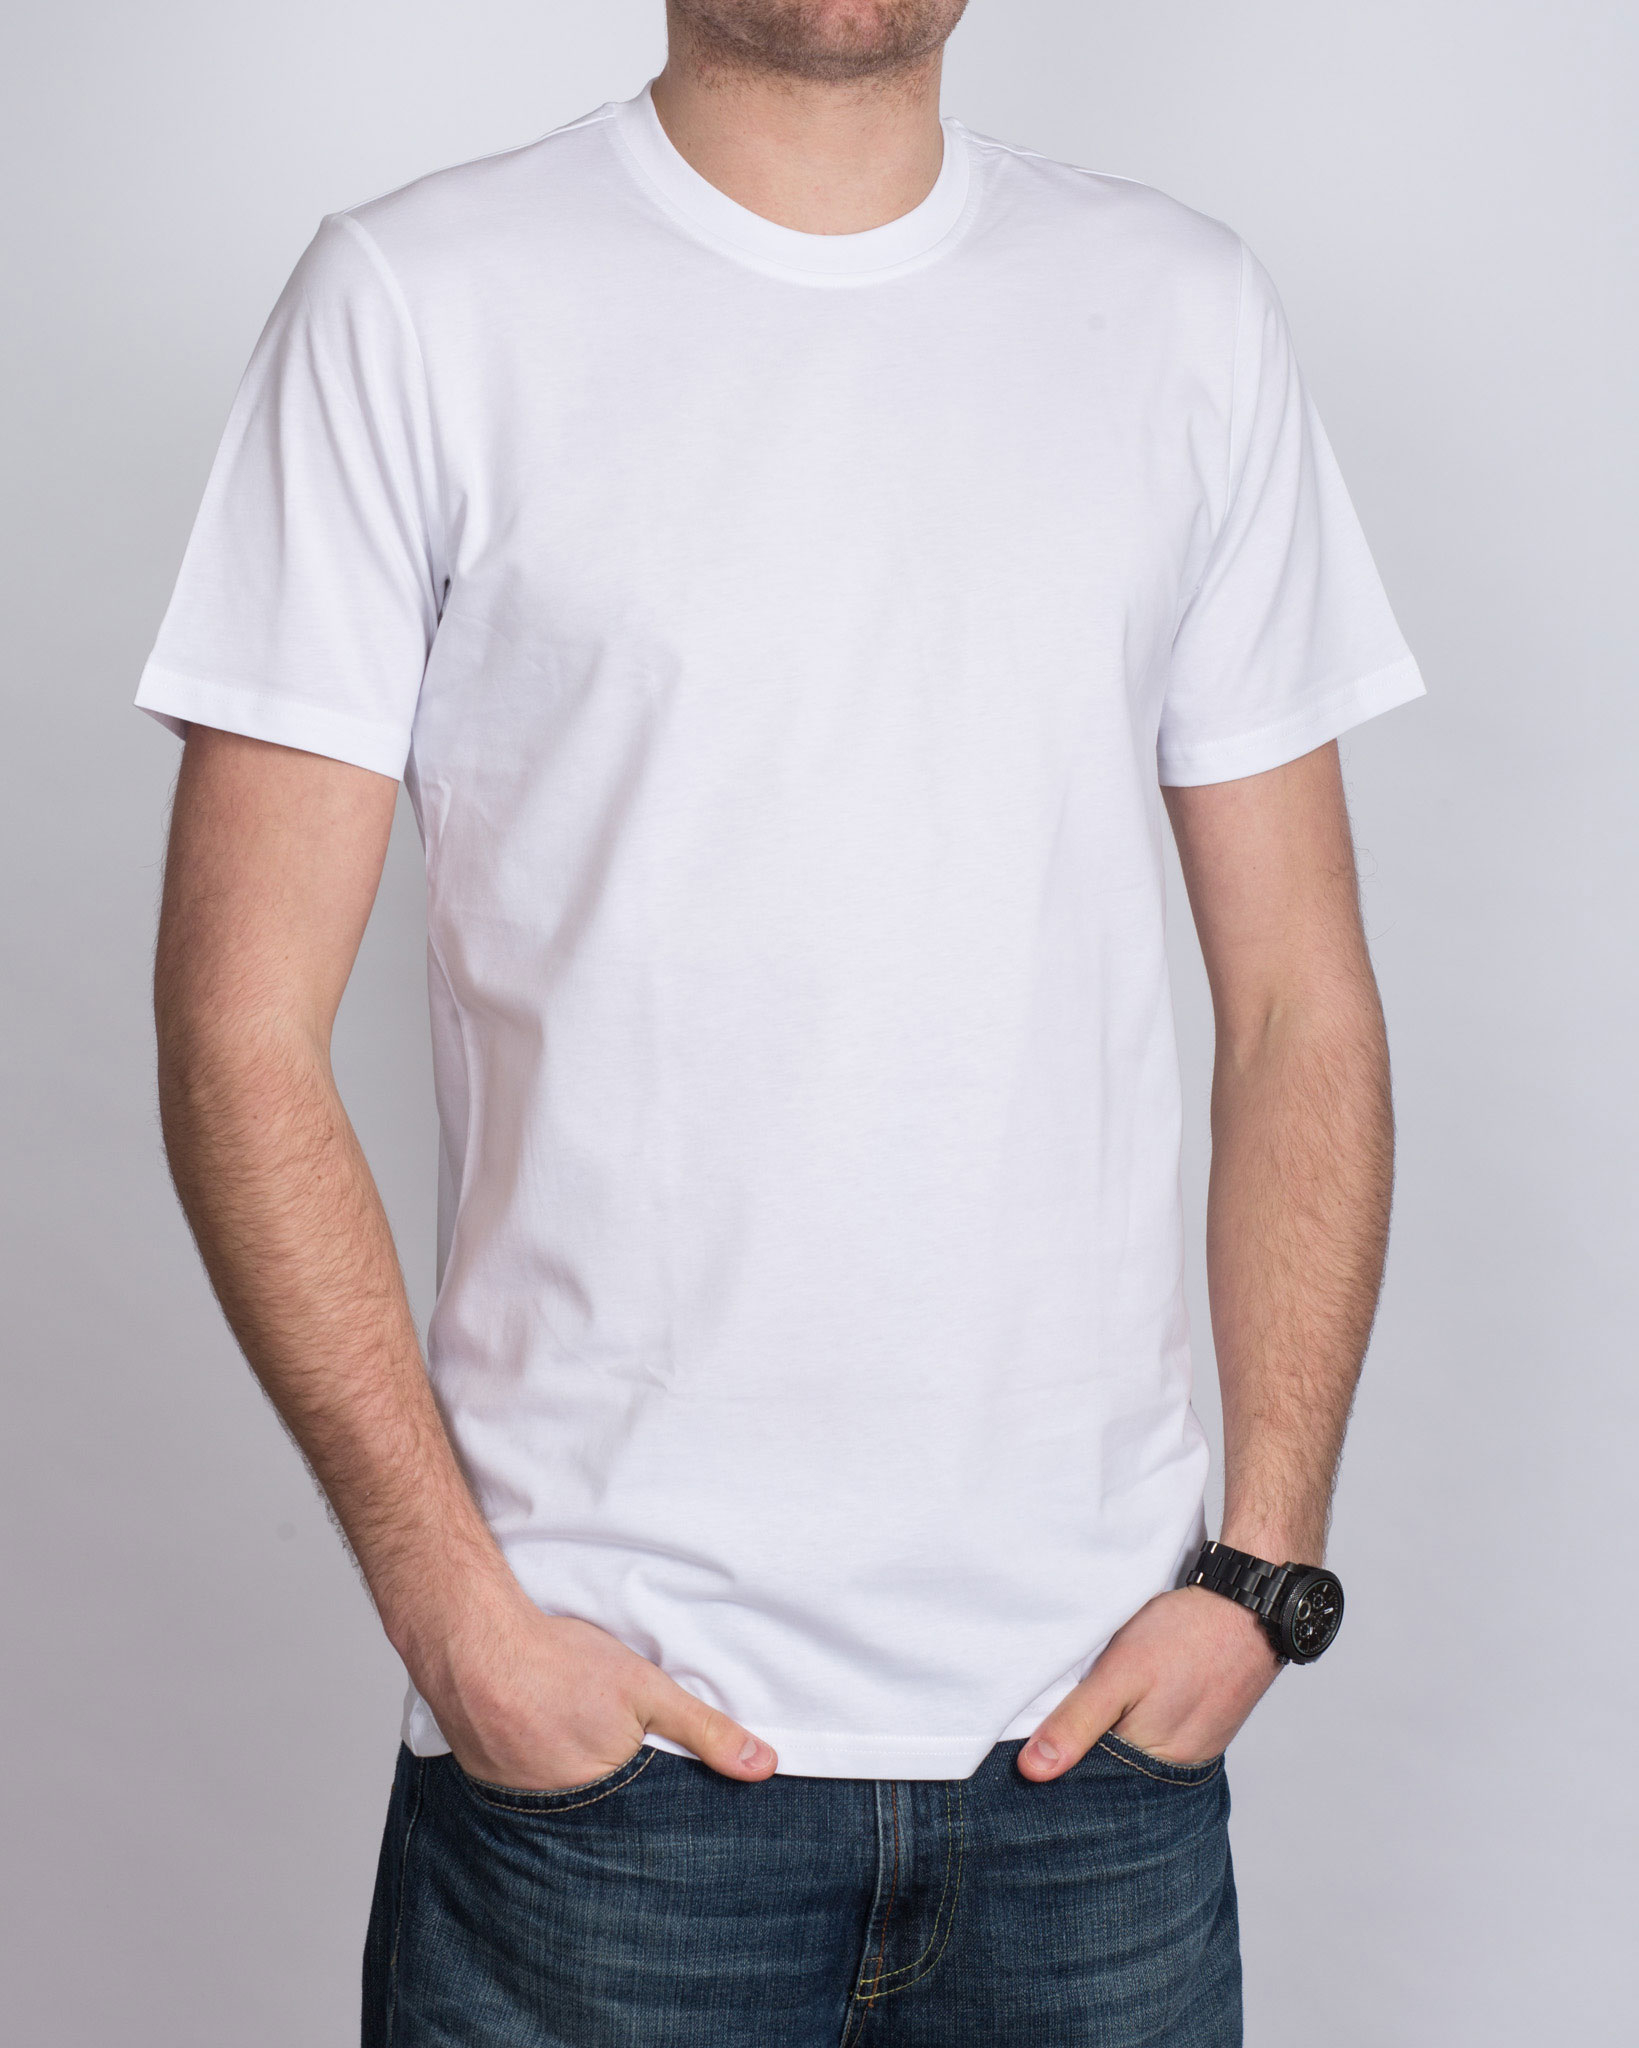 2T Tall T-Shirt (white)